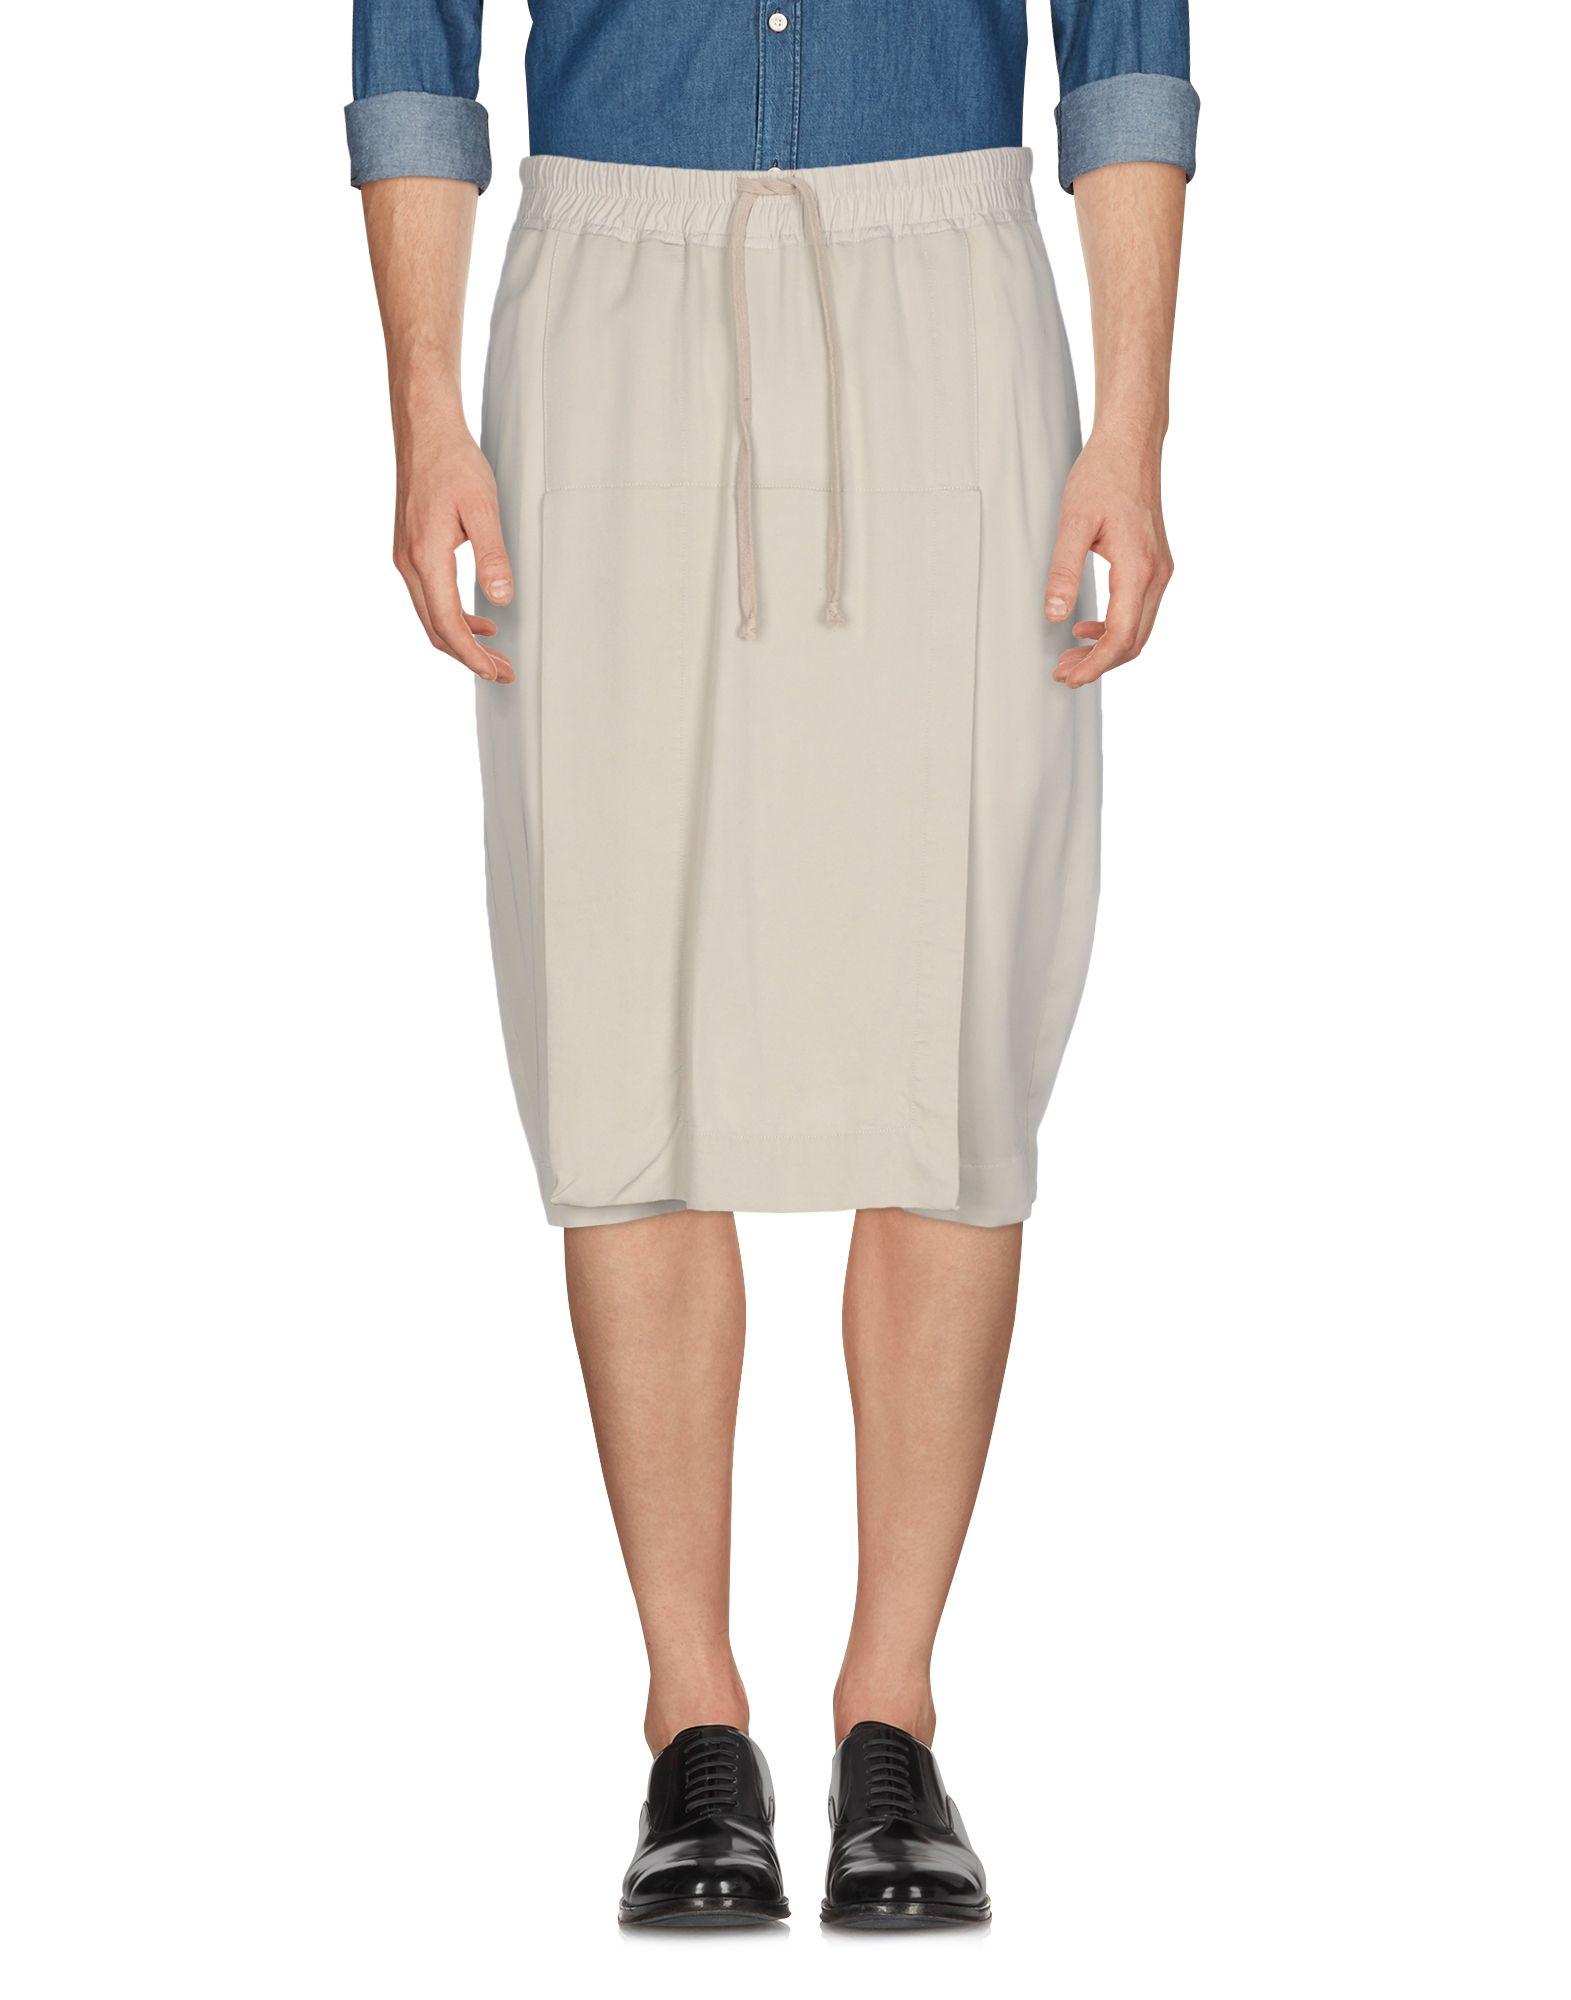 Pantalone Capri Rick Owens Uomo - Acquista online su